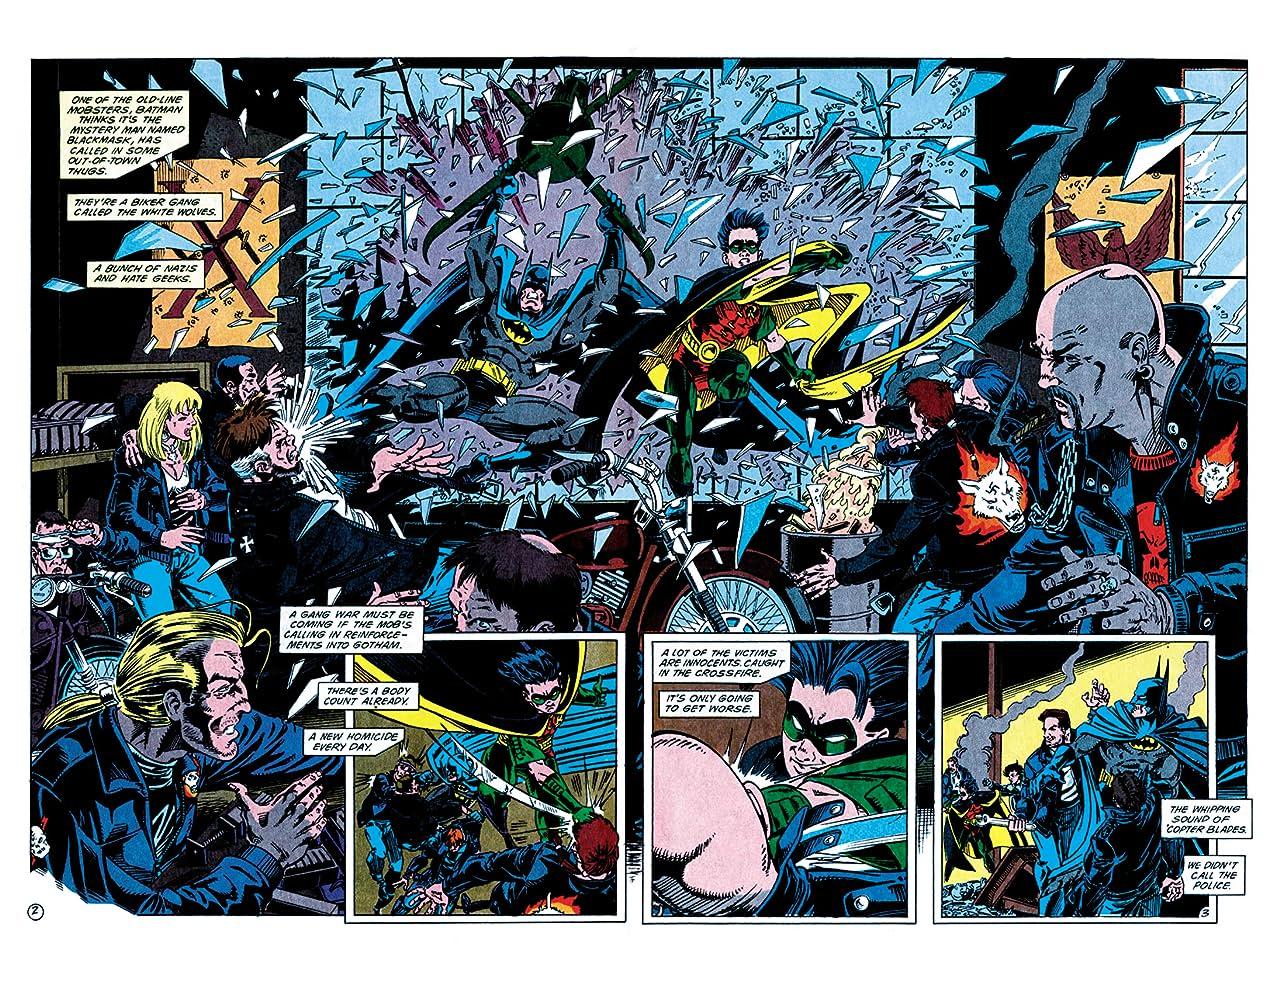 Robin III: Cry of the Huntress #1 (of 6)